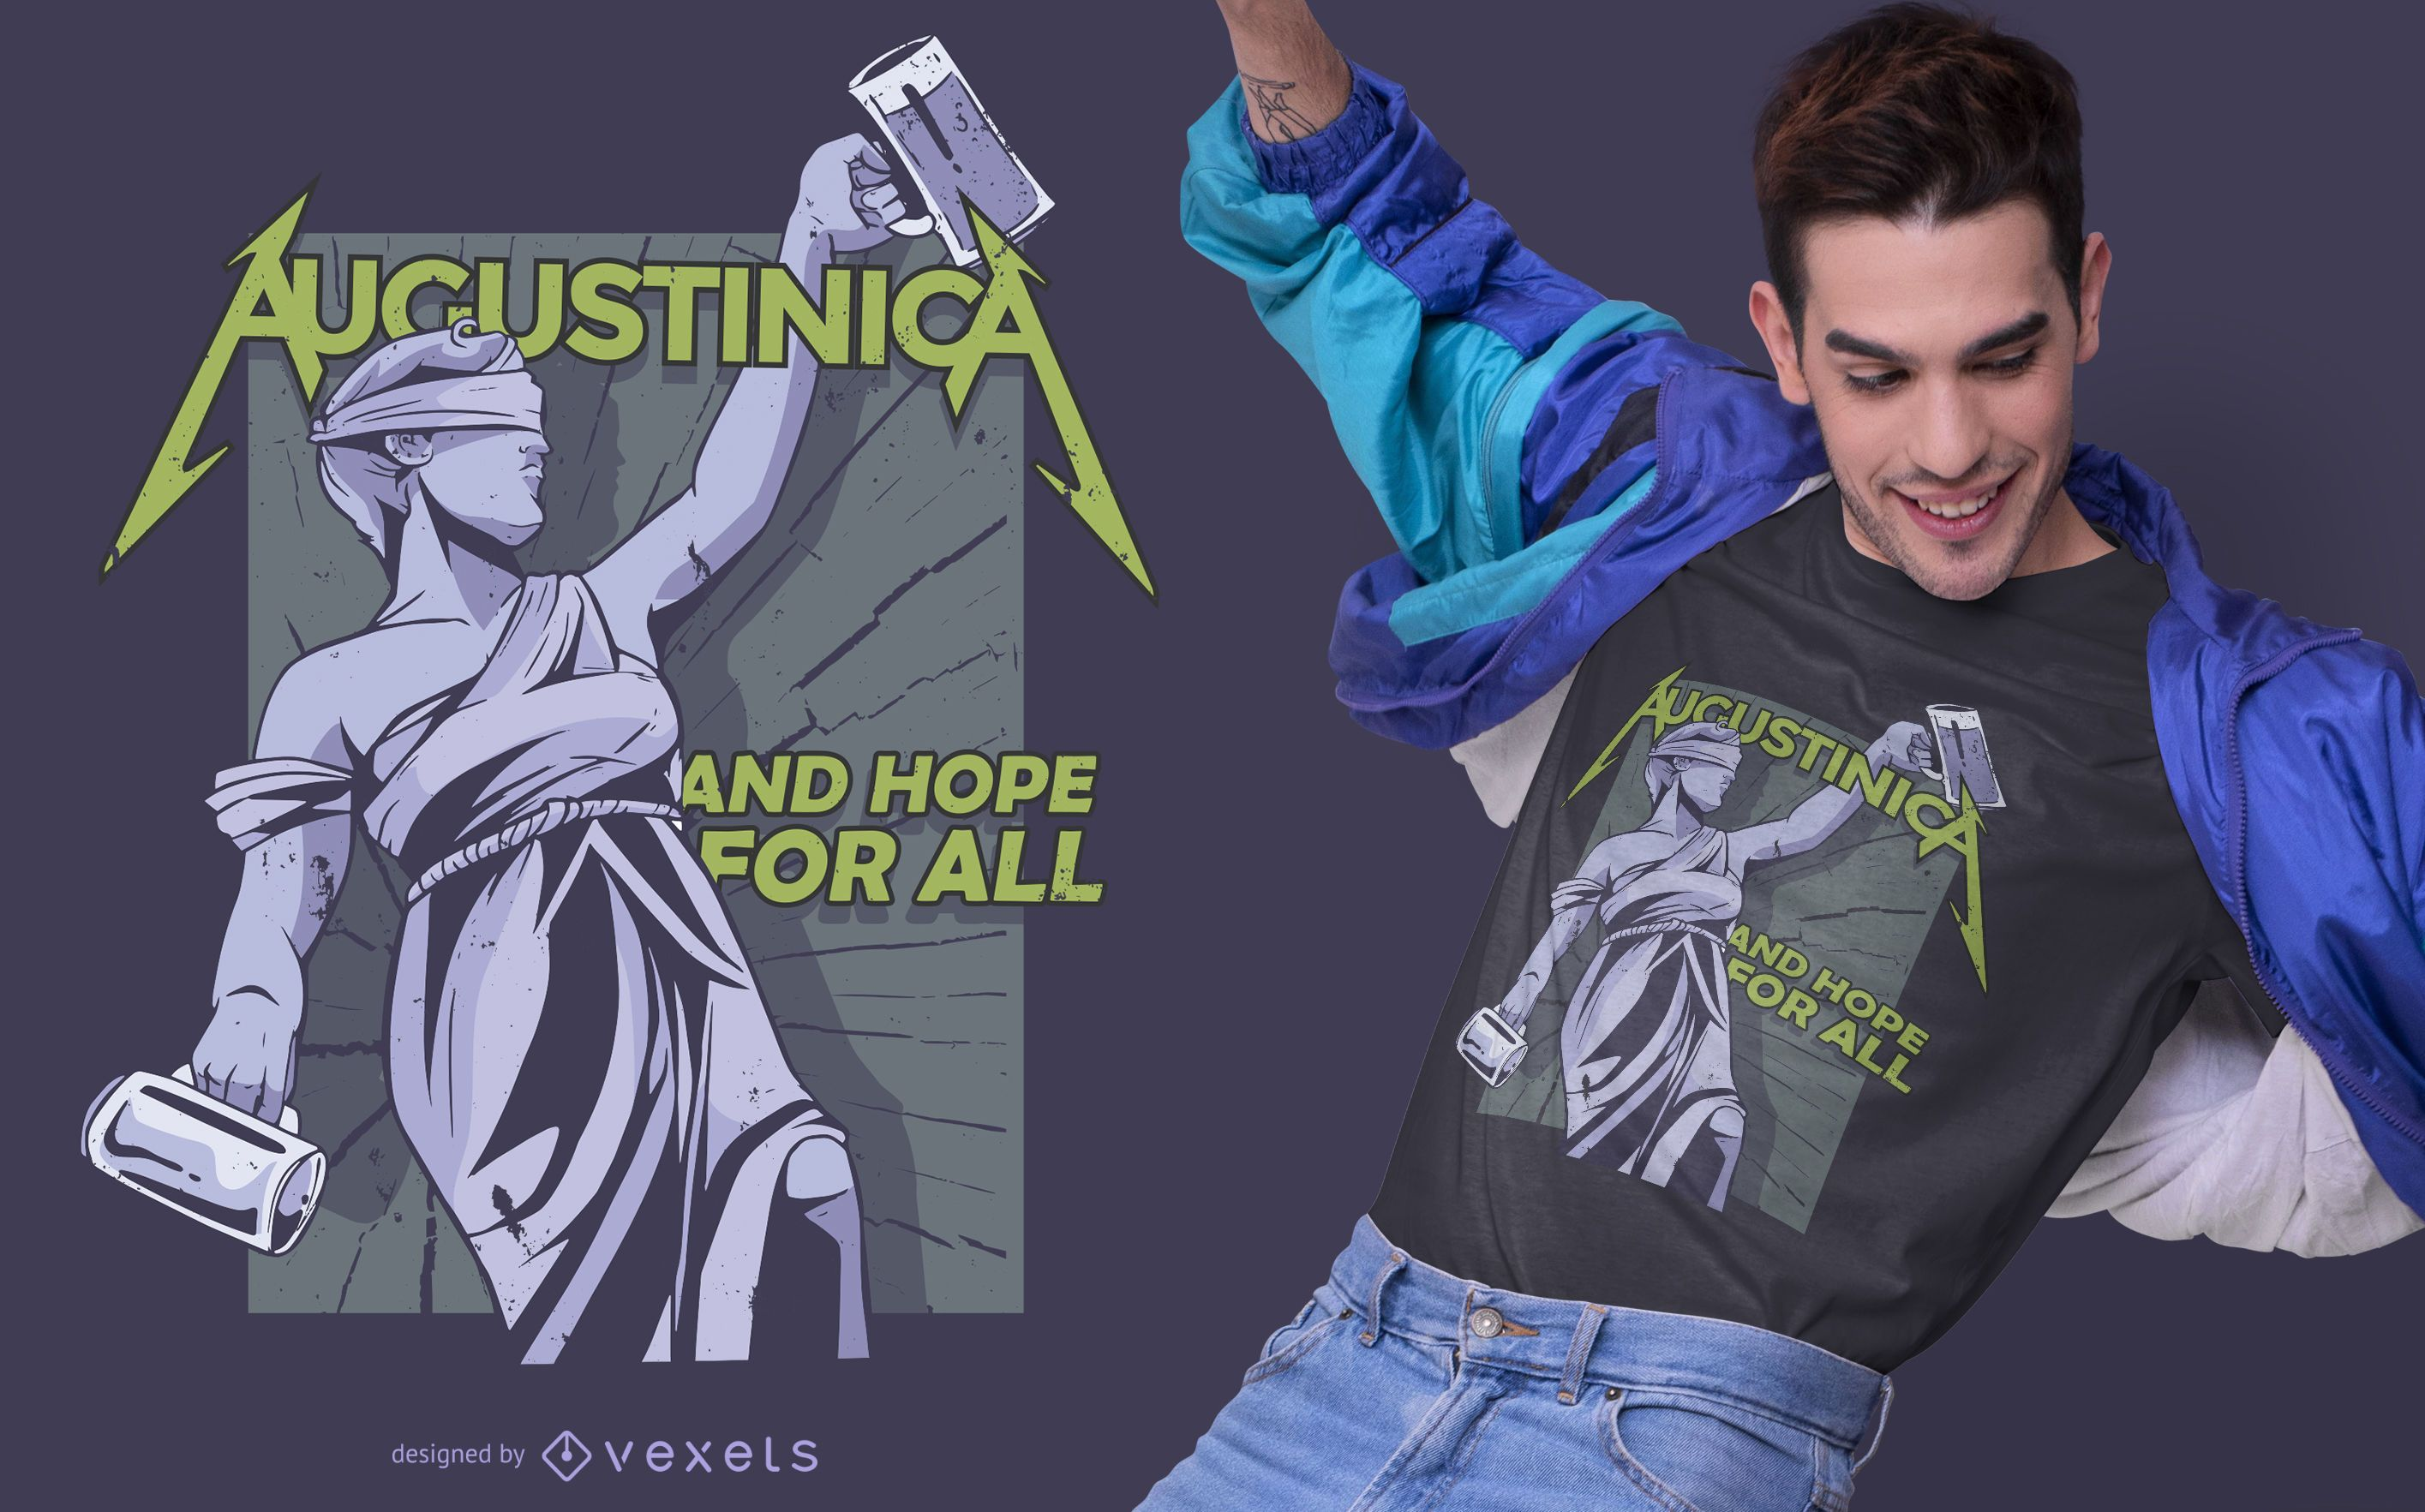 Augustinica Drinking T-shirt Design